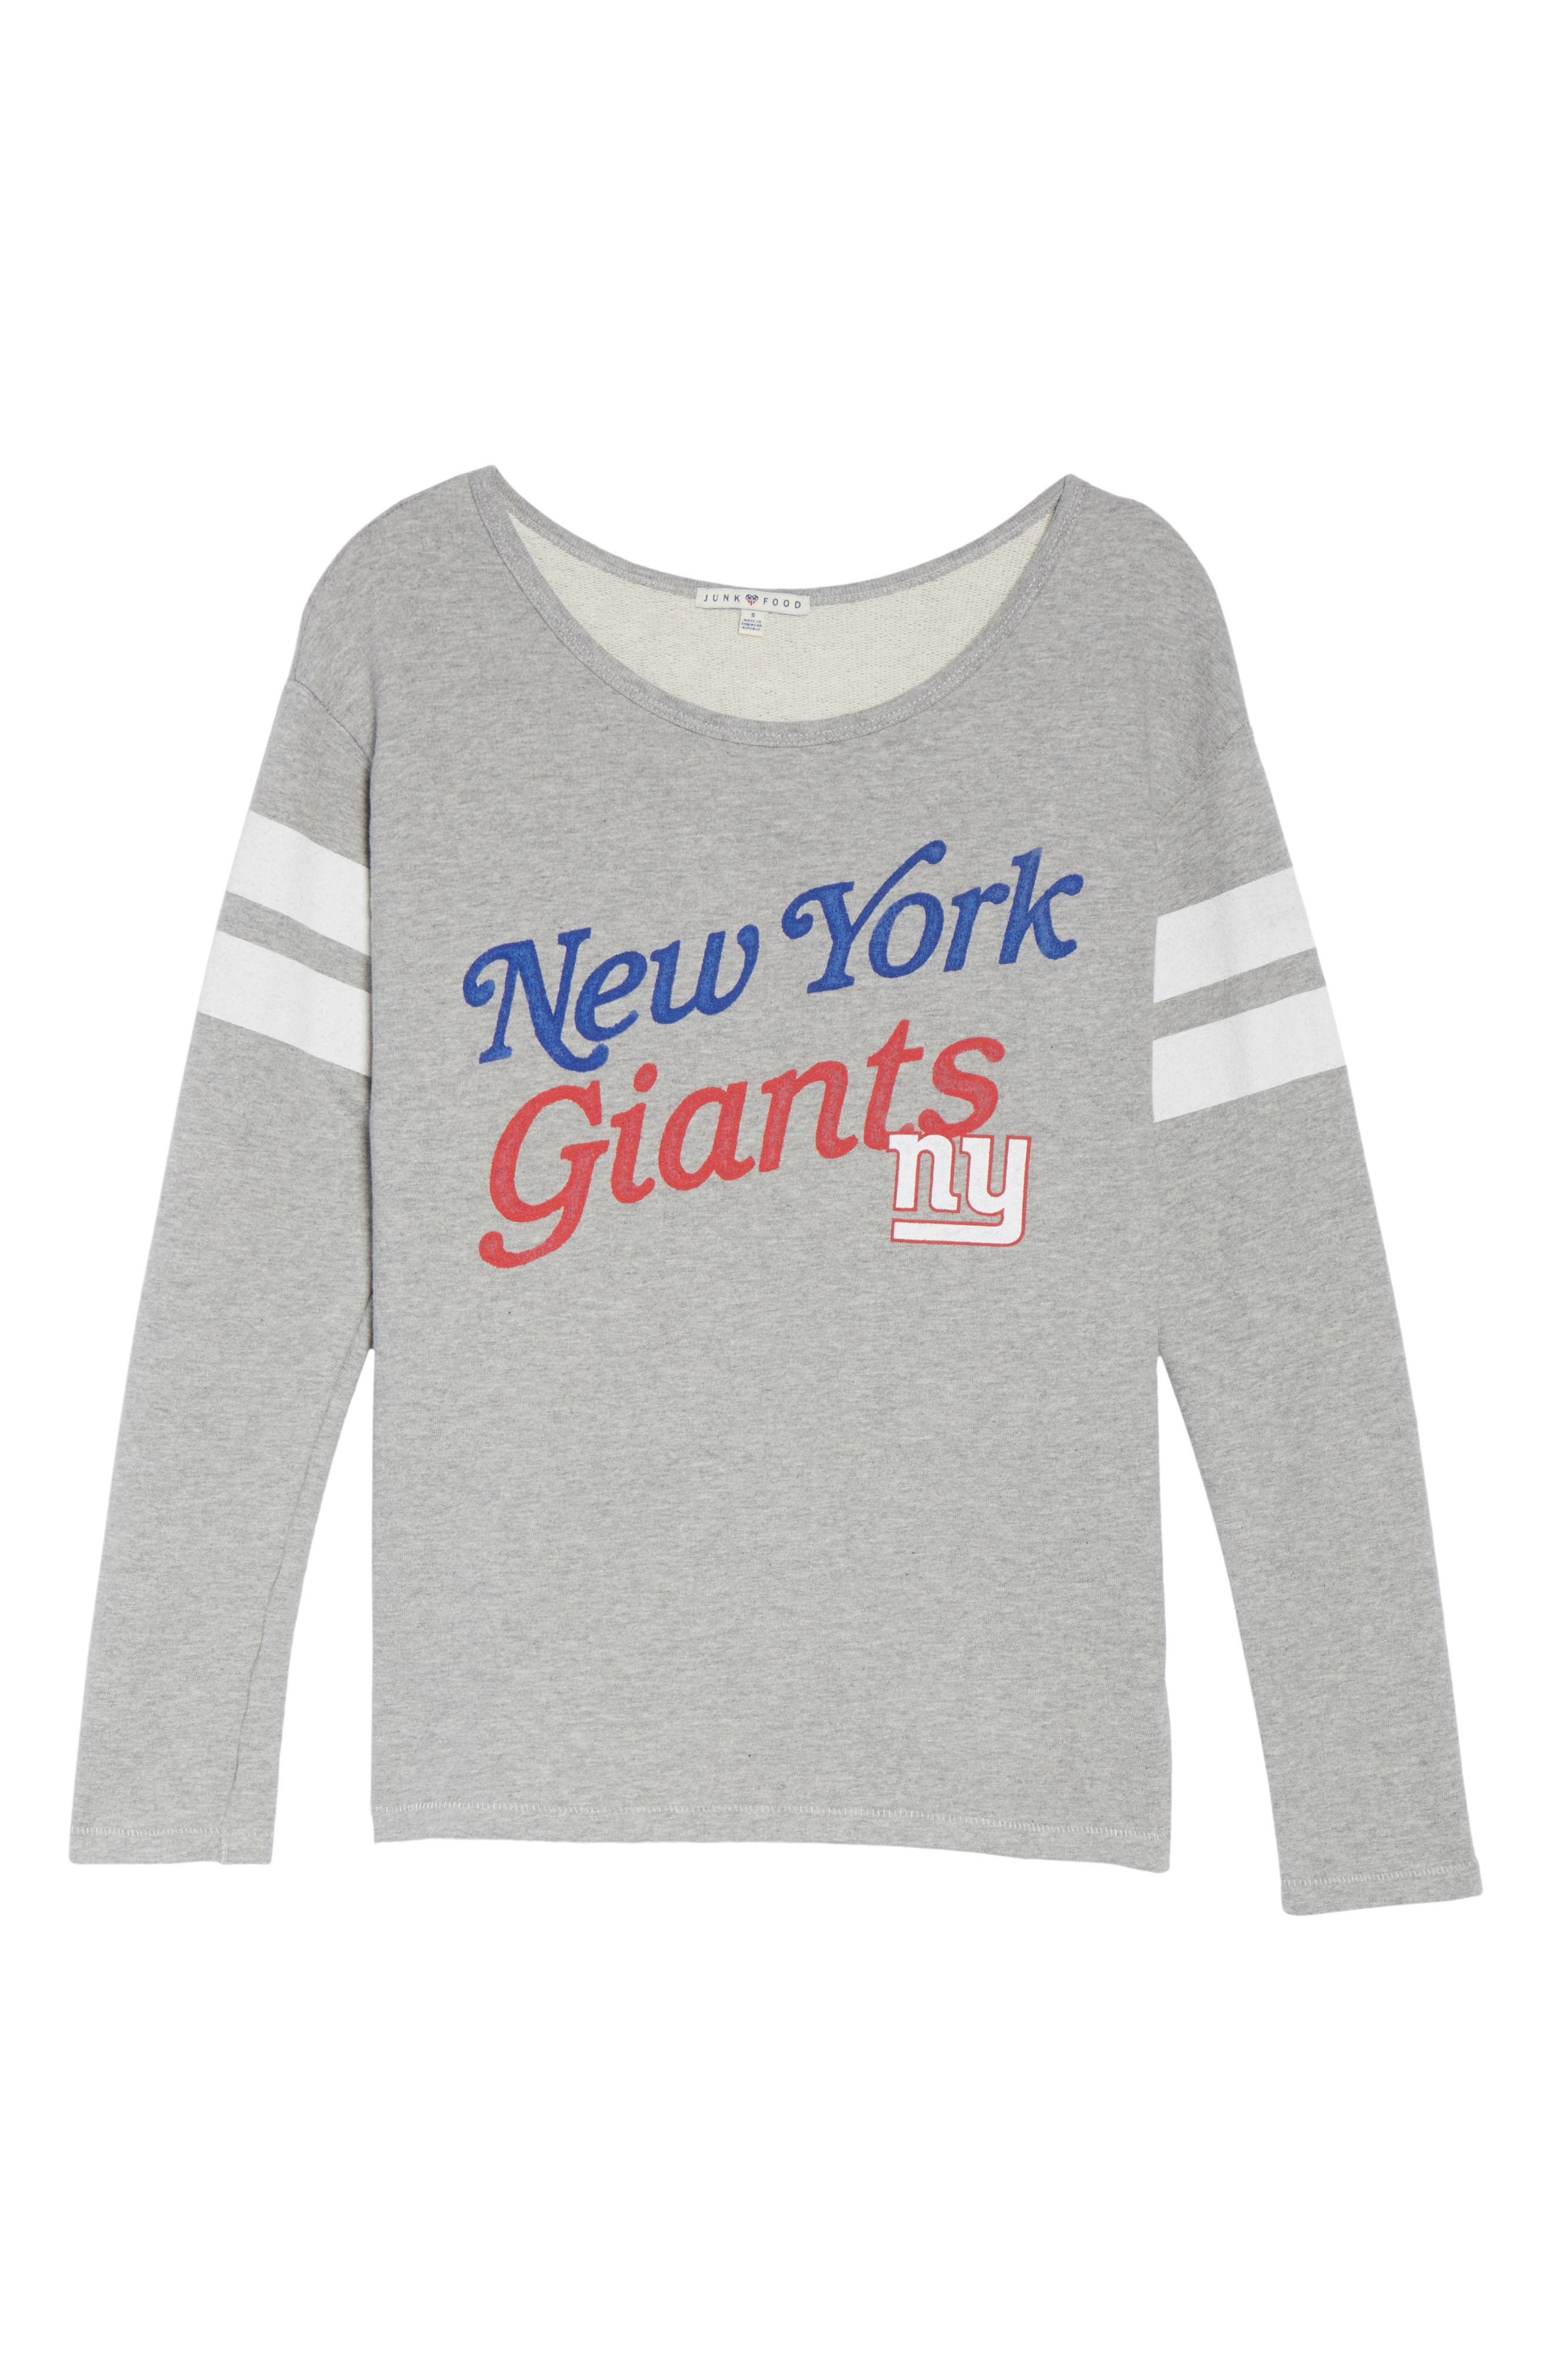 NFL New York Giants Champion Sweatshirt,                             Alternate thumbnail 4, color,                             Grey